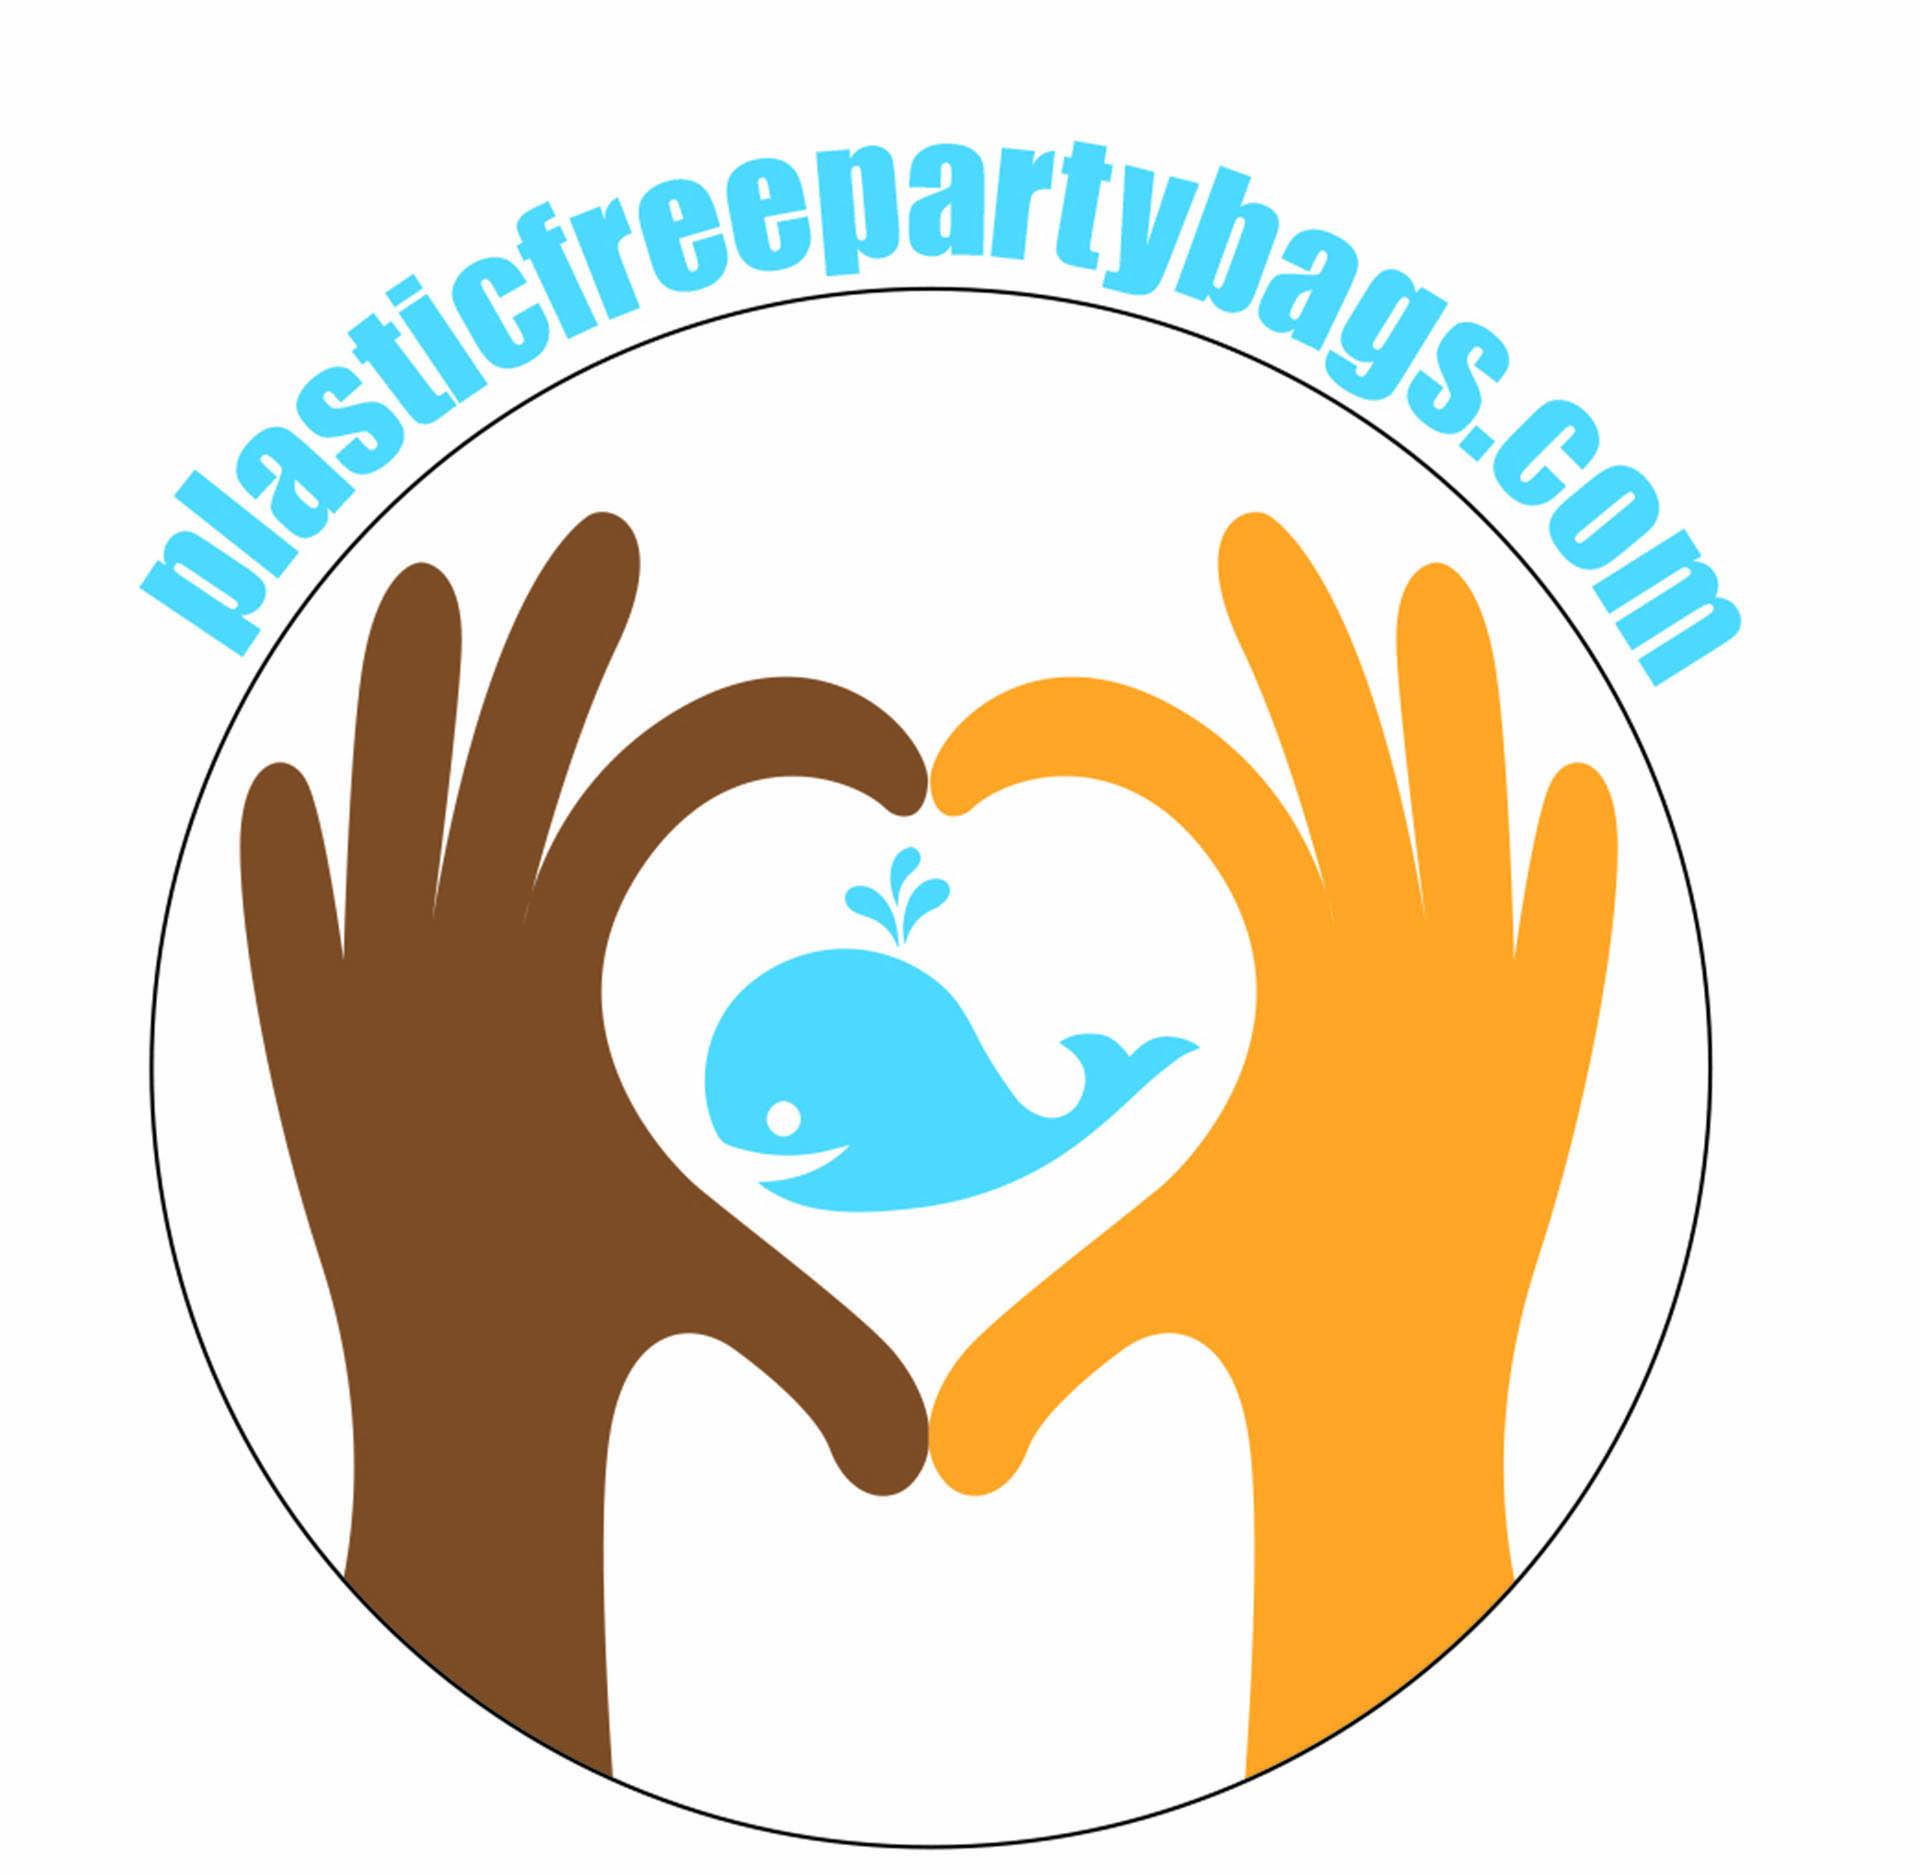 Plasticfreepartybags.com's logo